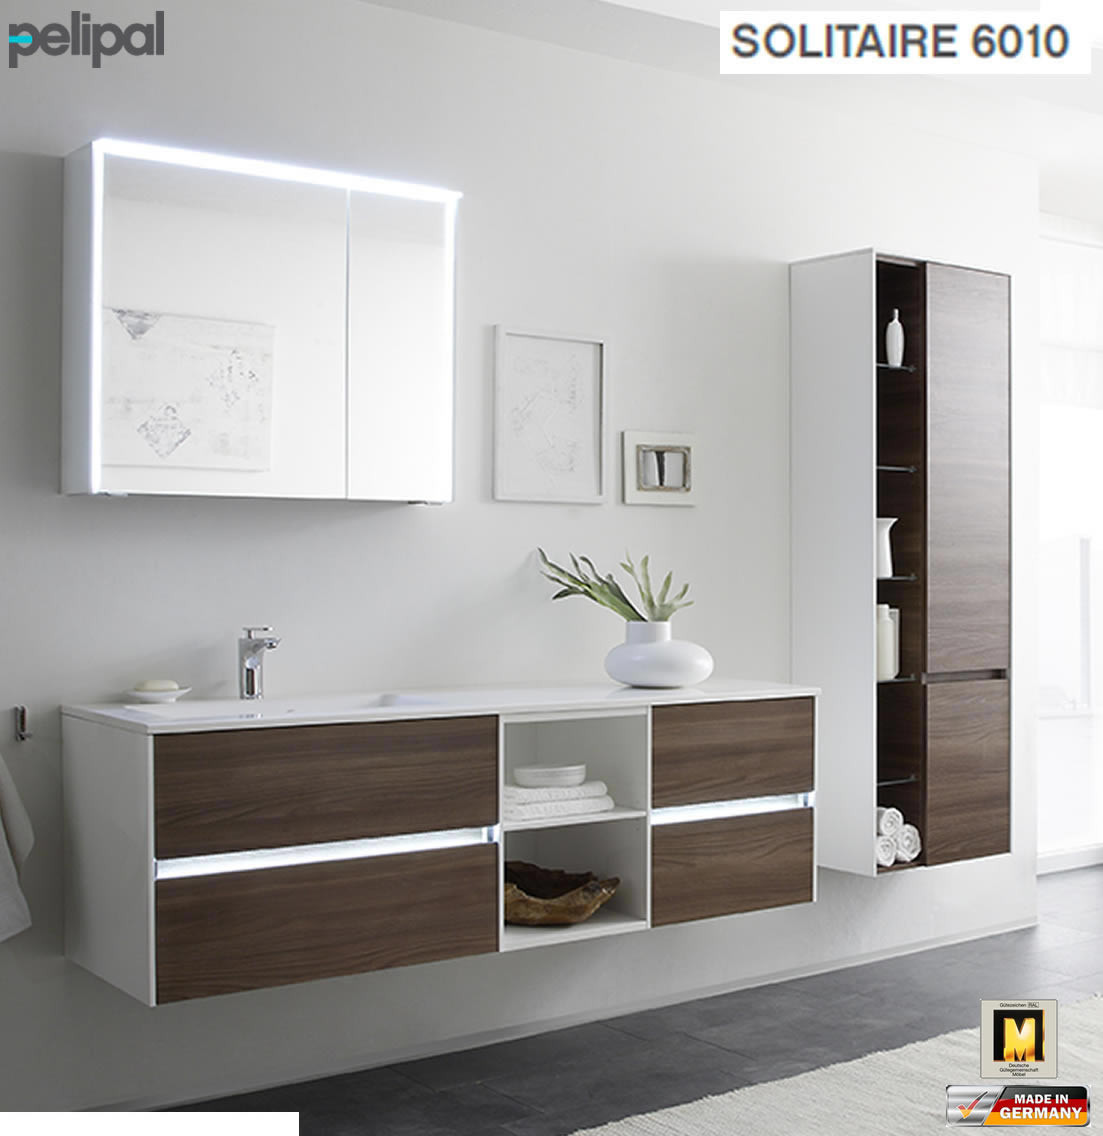 Badmöbel Pelipal  Pelipal Solitaire 6010 Badmöbel Set mit 168 cm